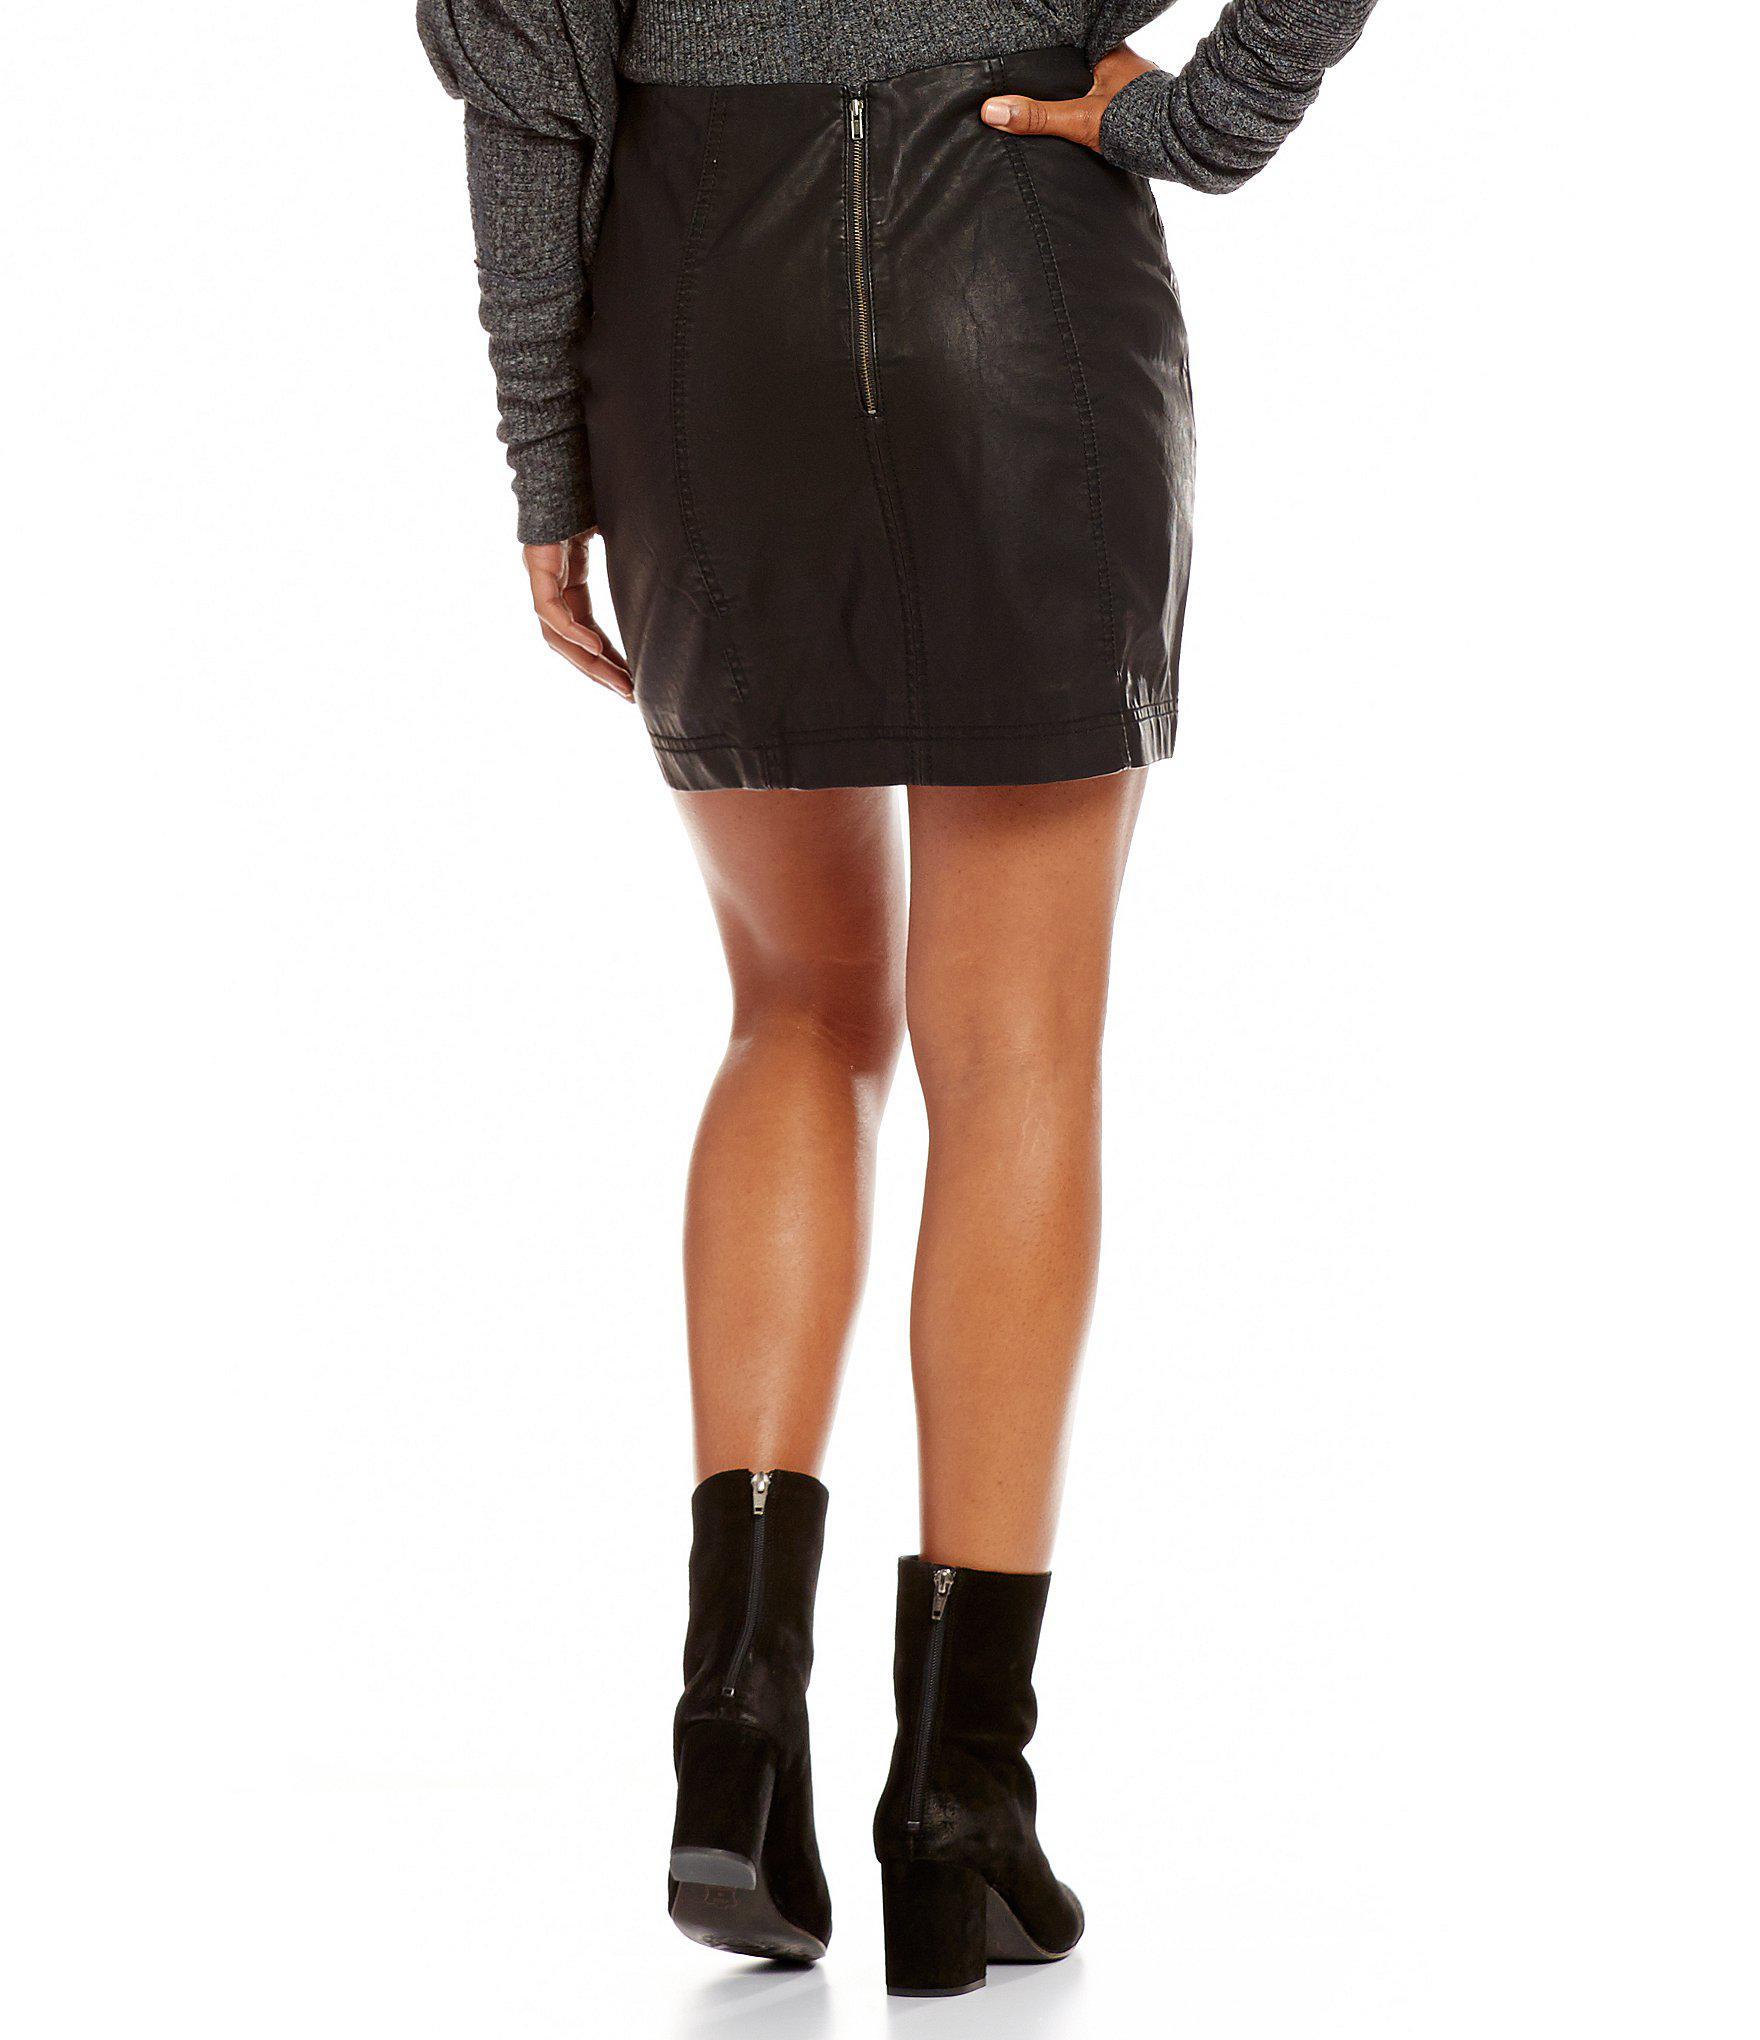 46dbd81dfa Free People Modern Femme Vegan Faux Leather Mini Skirt in Black - Lyst